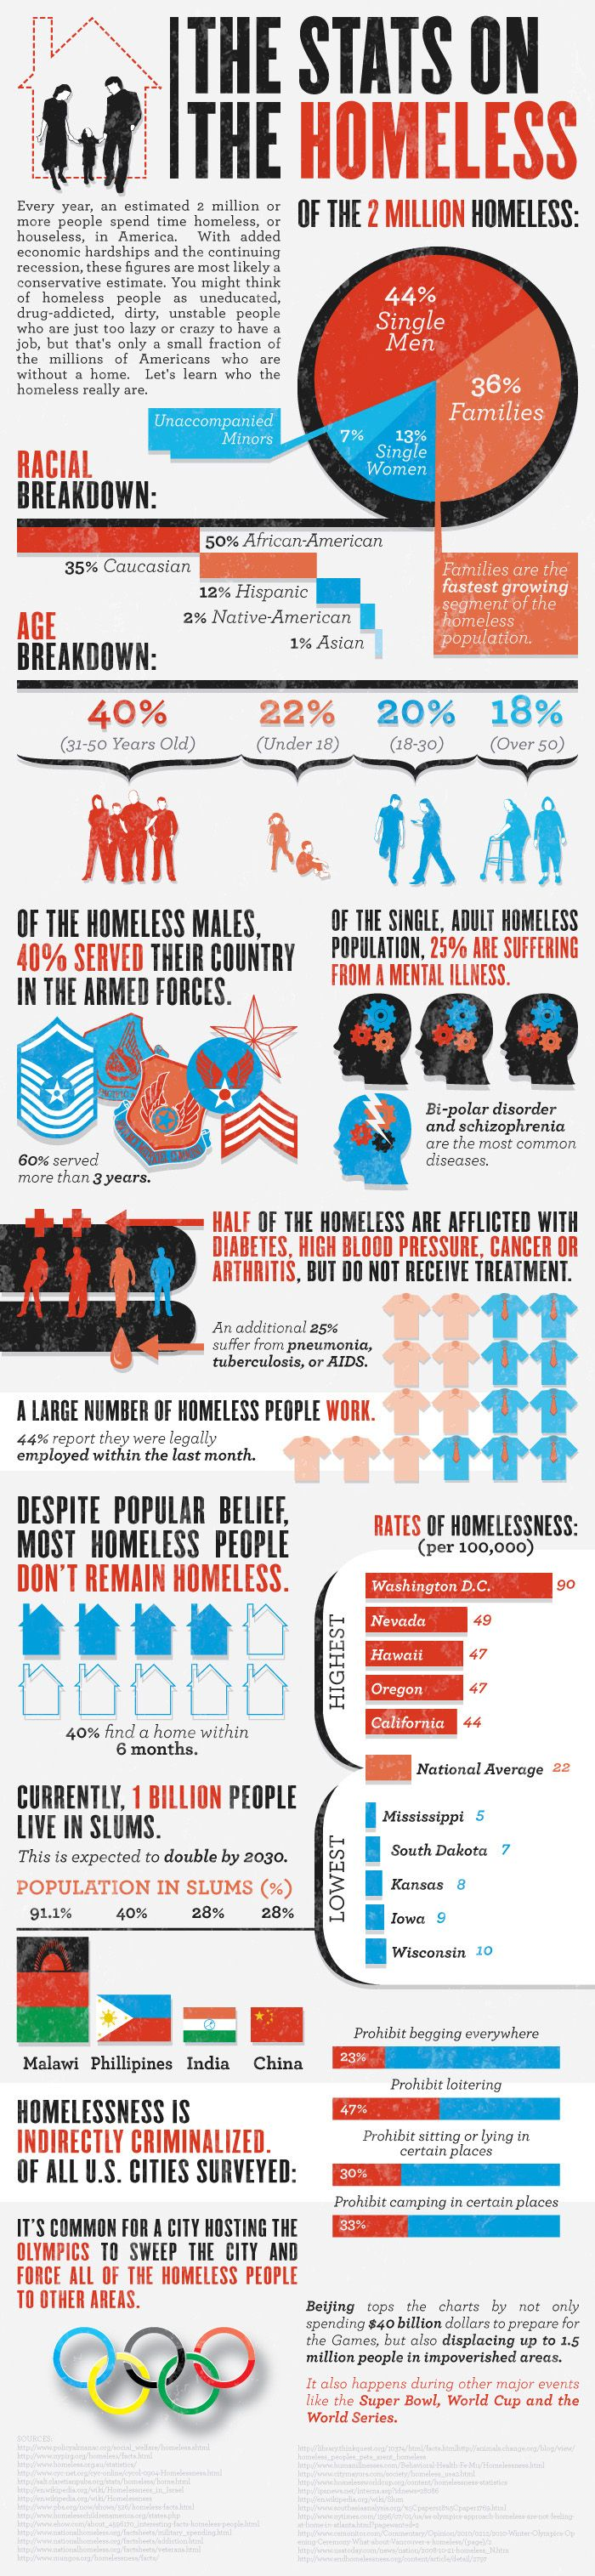 homeless statistics